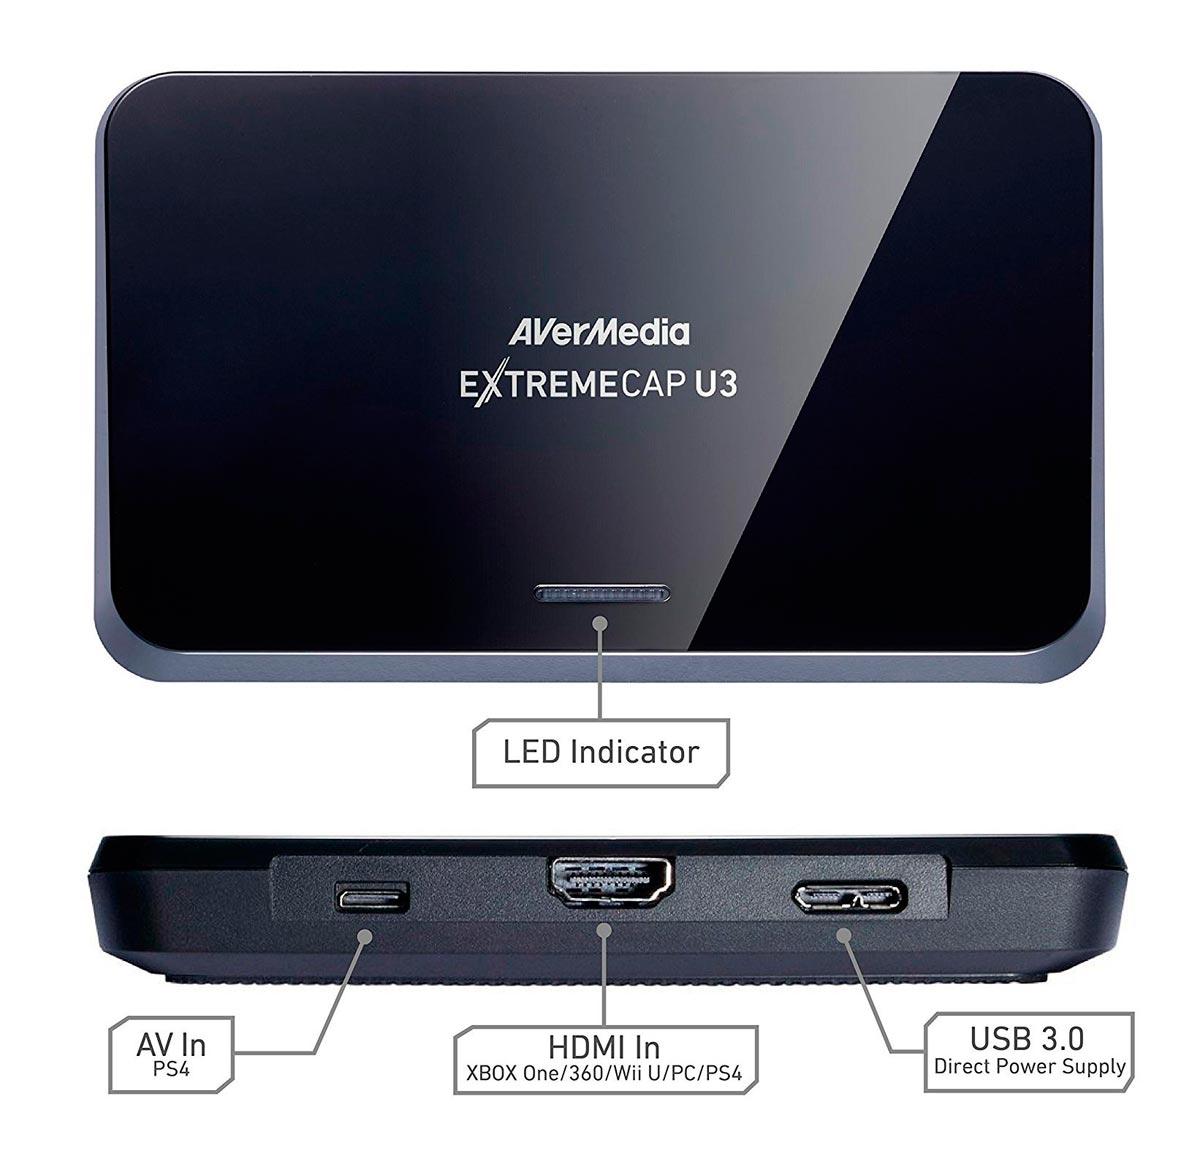 Placa Captura Avermedia Extremecap U3 1080p 60fps USB 3.0 - CV710